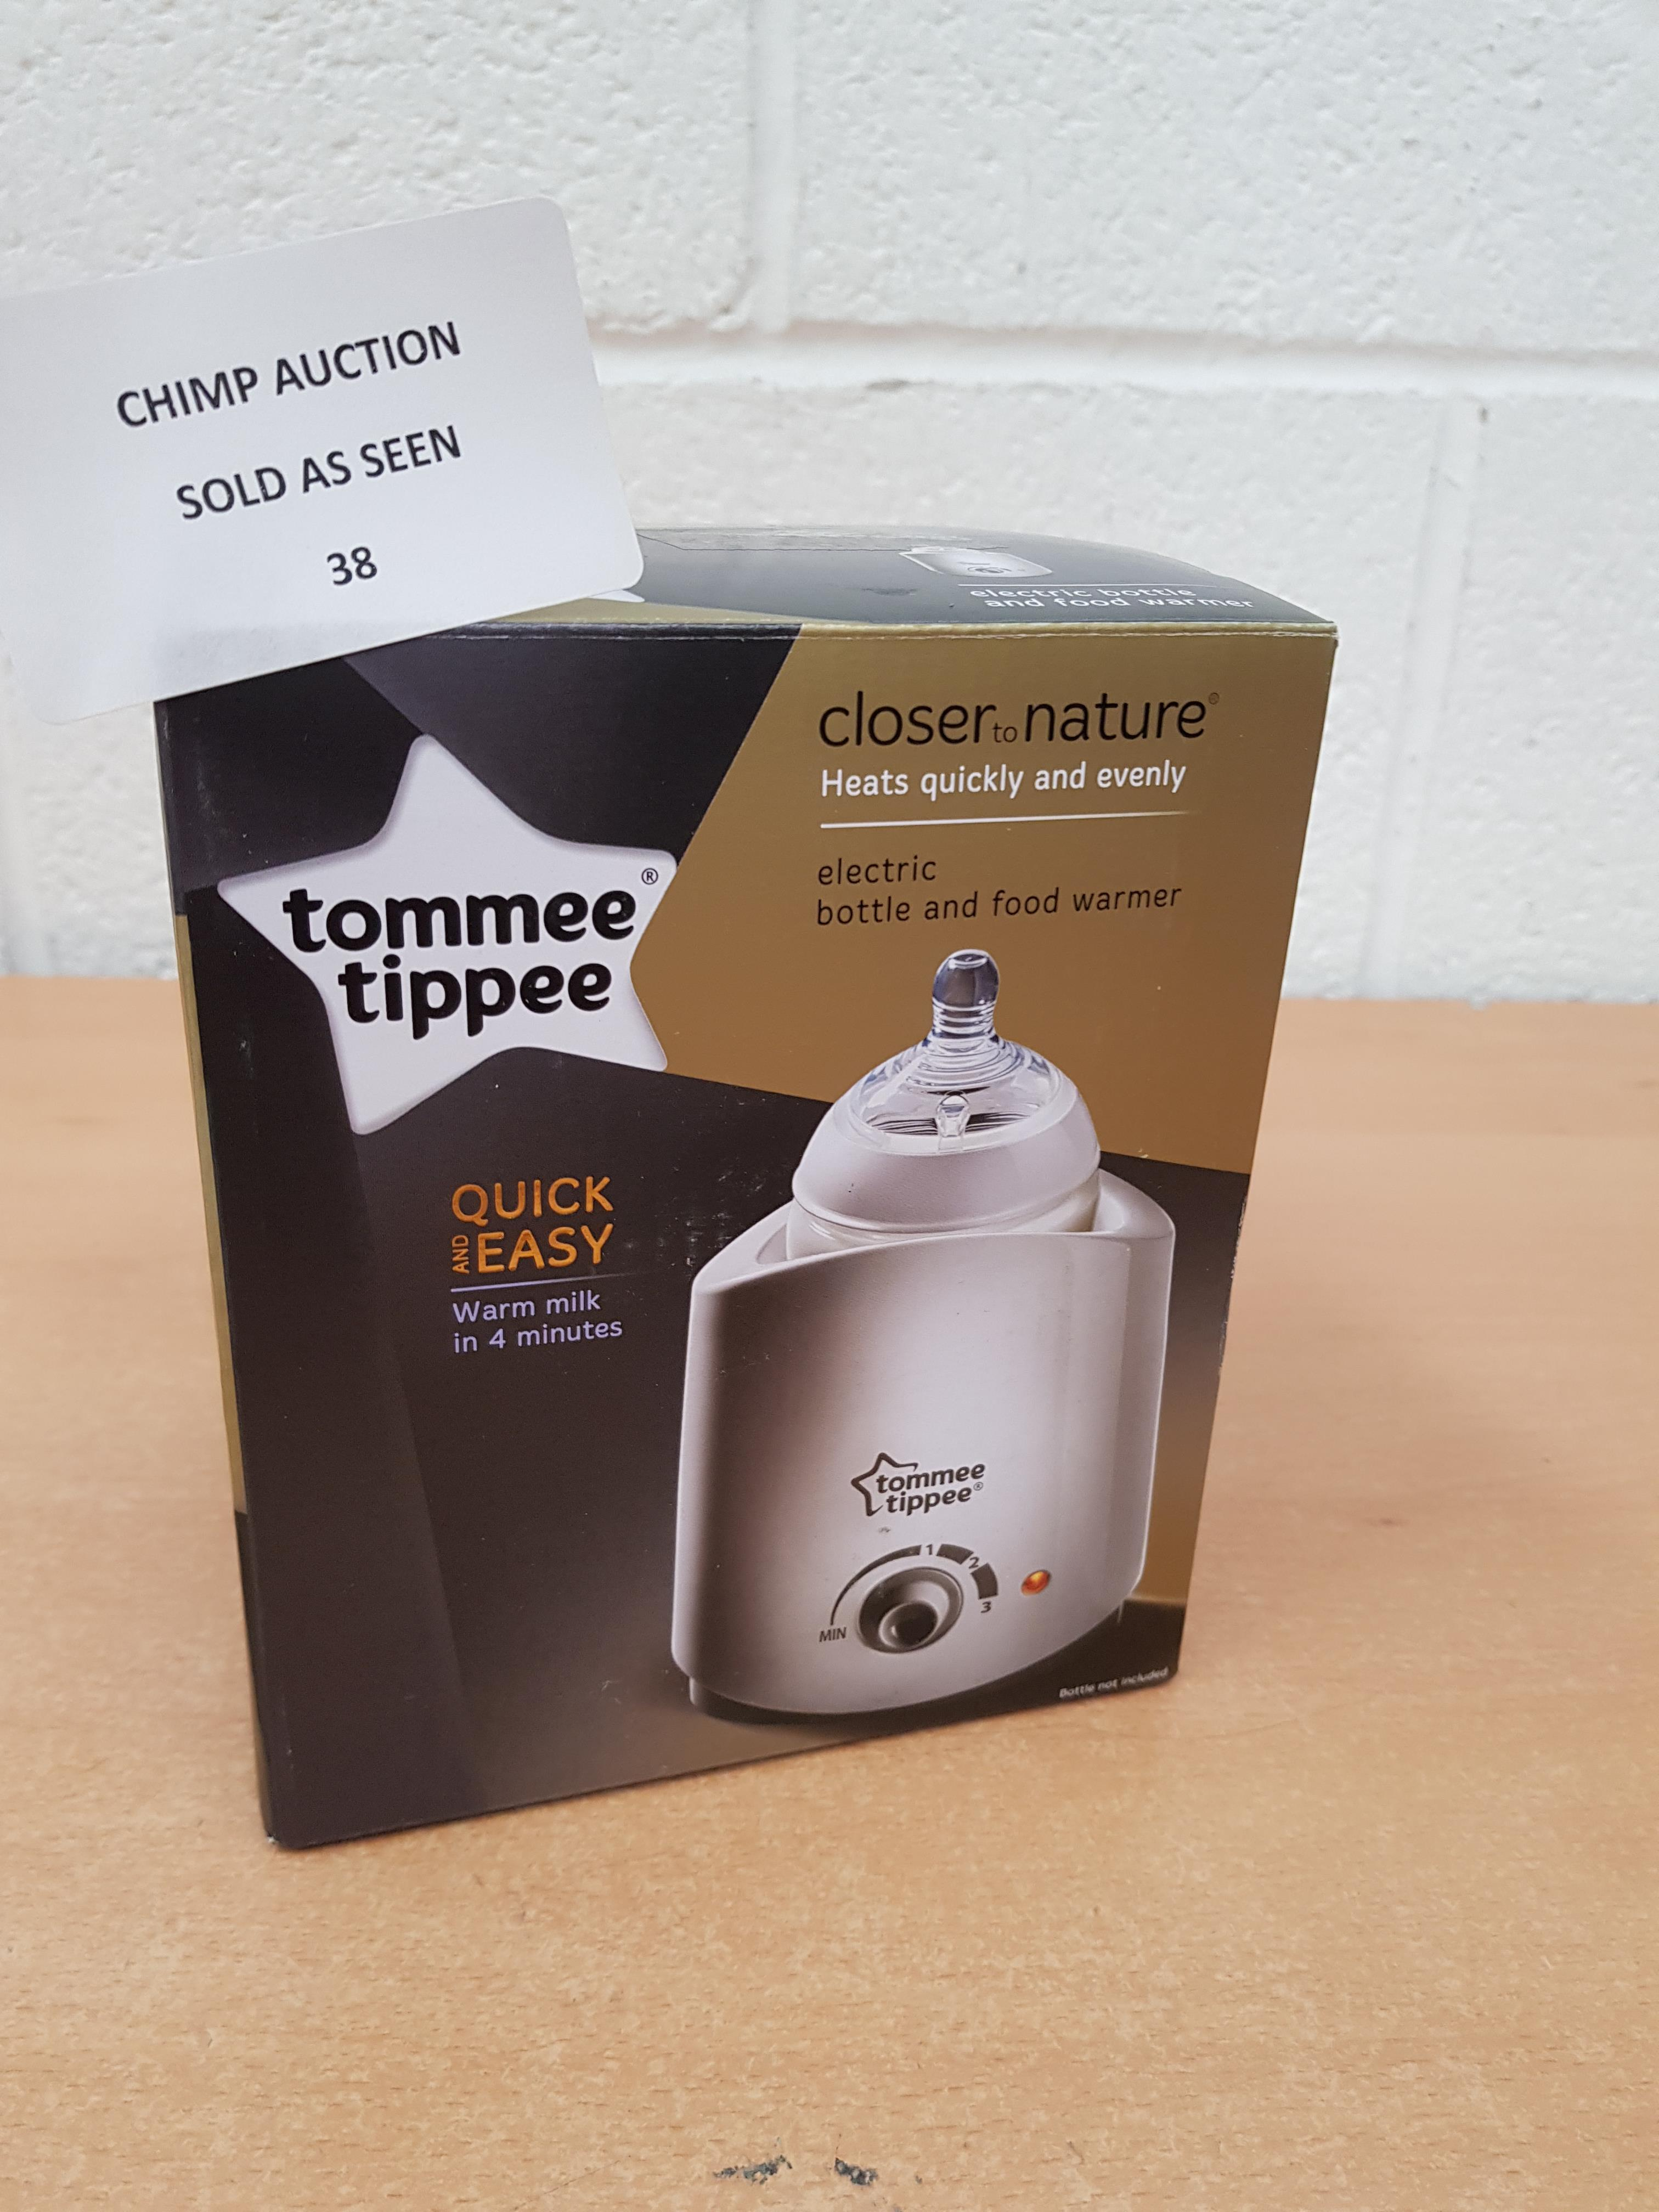 Lot 38 - Tommee Tippee electric Bottle & food warmer